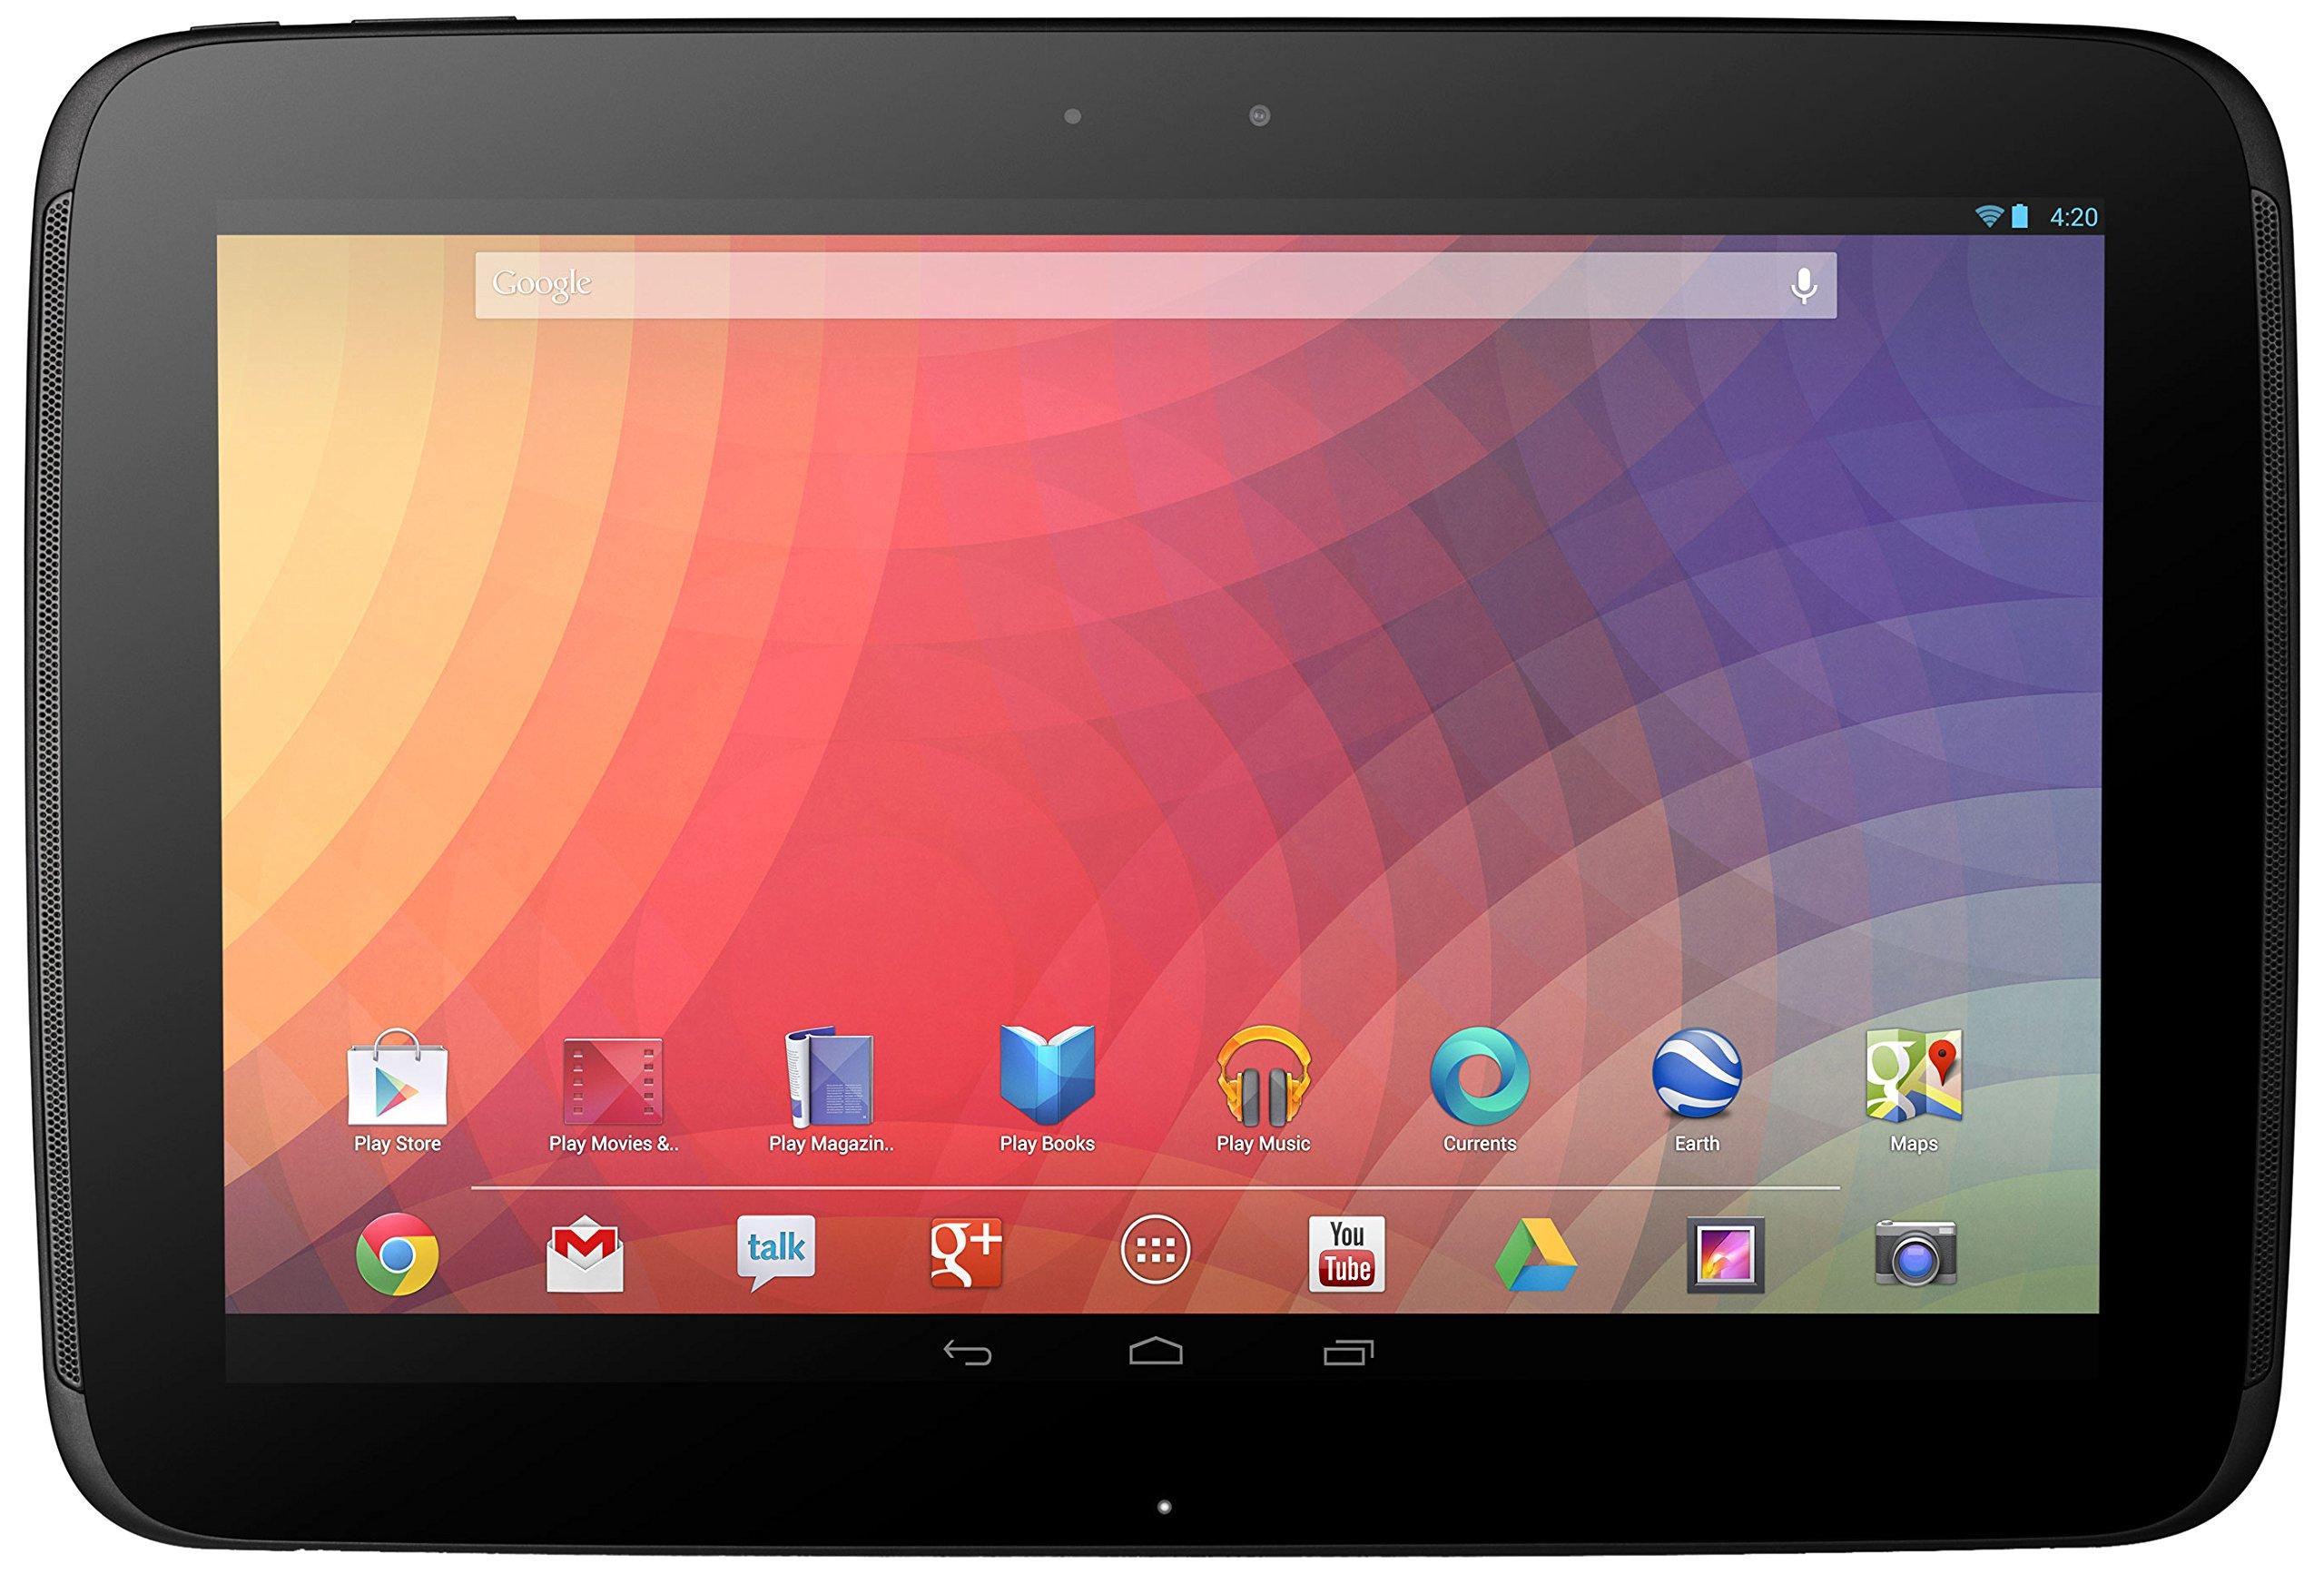 Google Nexus 10 (Wi-Fi only, 32 GB) by Samsung